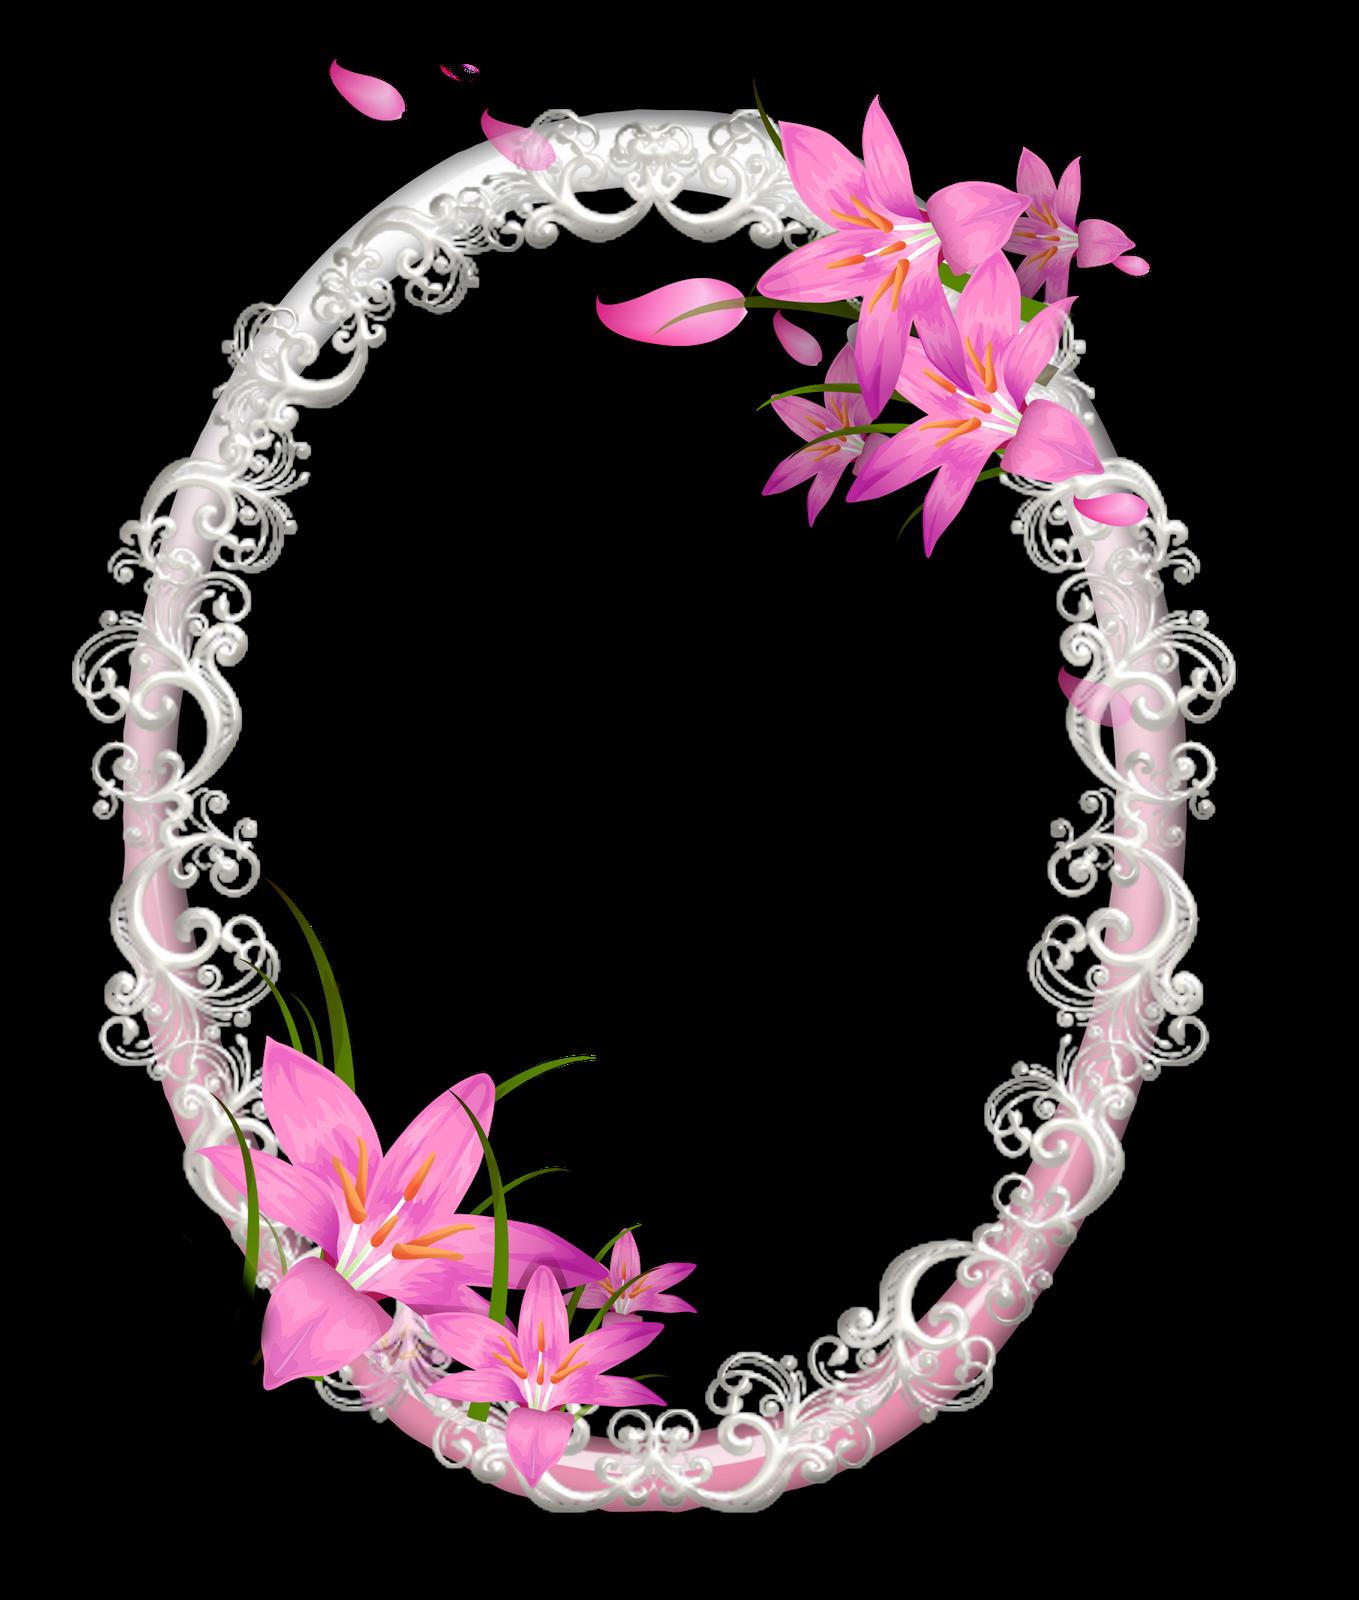 Marcos gratis para fotos marcos florales para fotos - Marcos transparentes ...